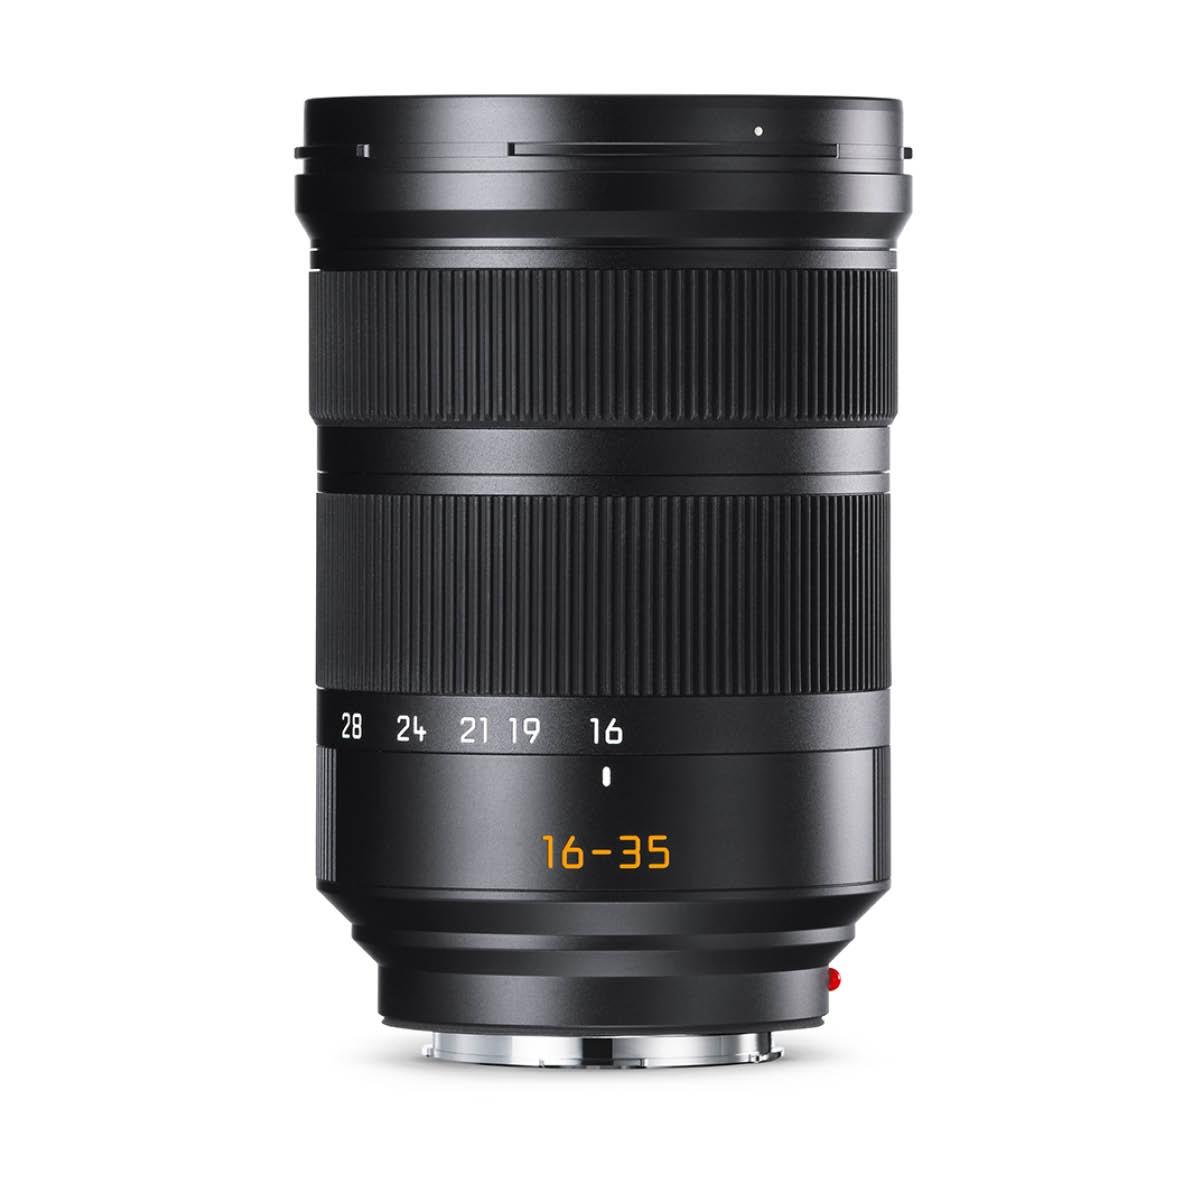 Leica 16-35 mm 1:3.5-4.5 Super-Vario-Elmar-SL ASPH